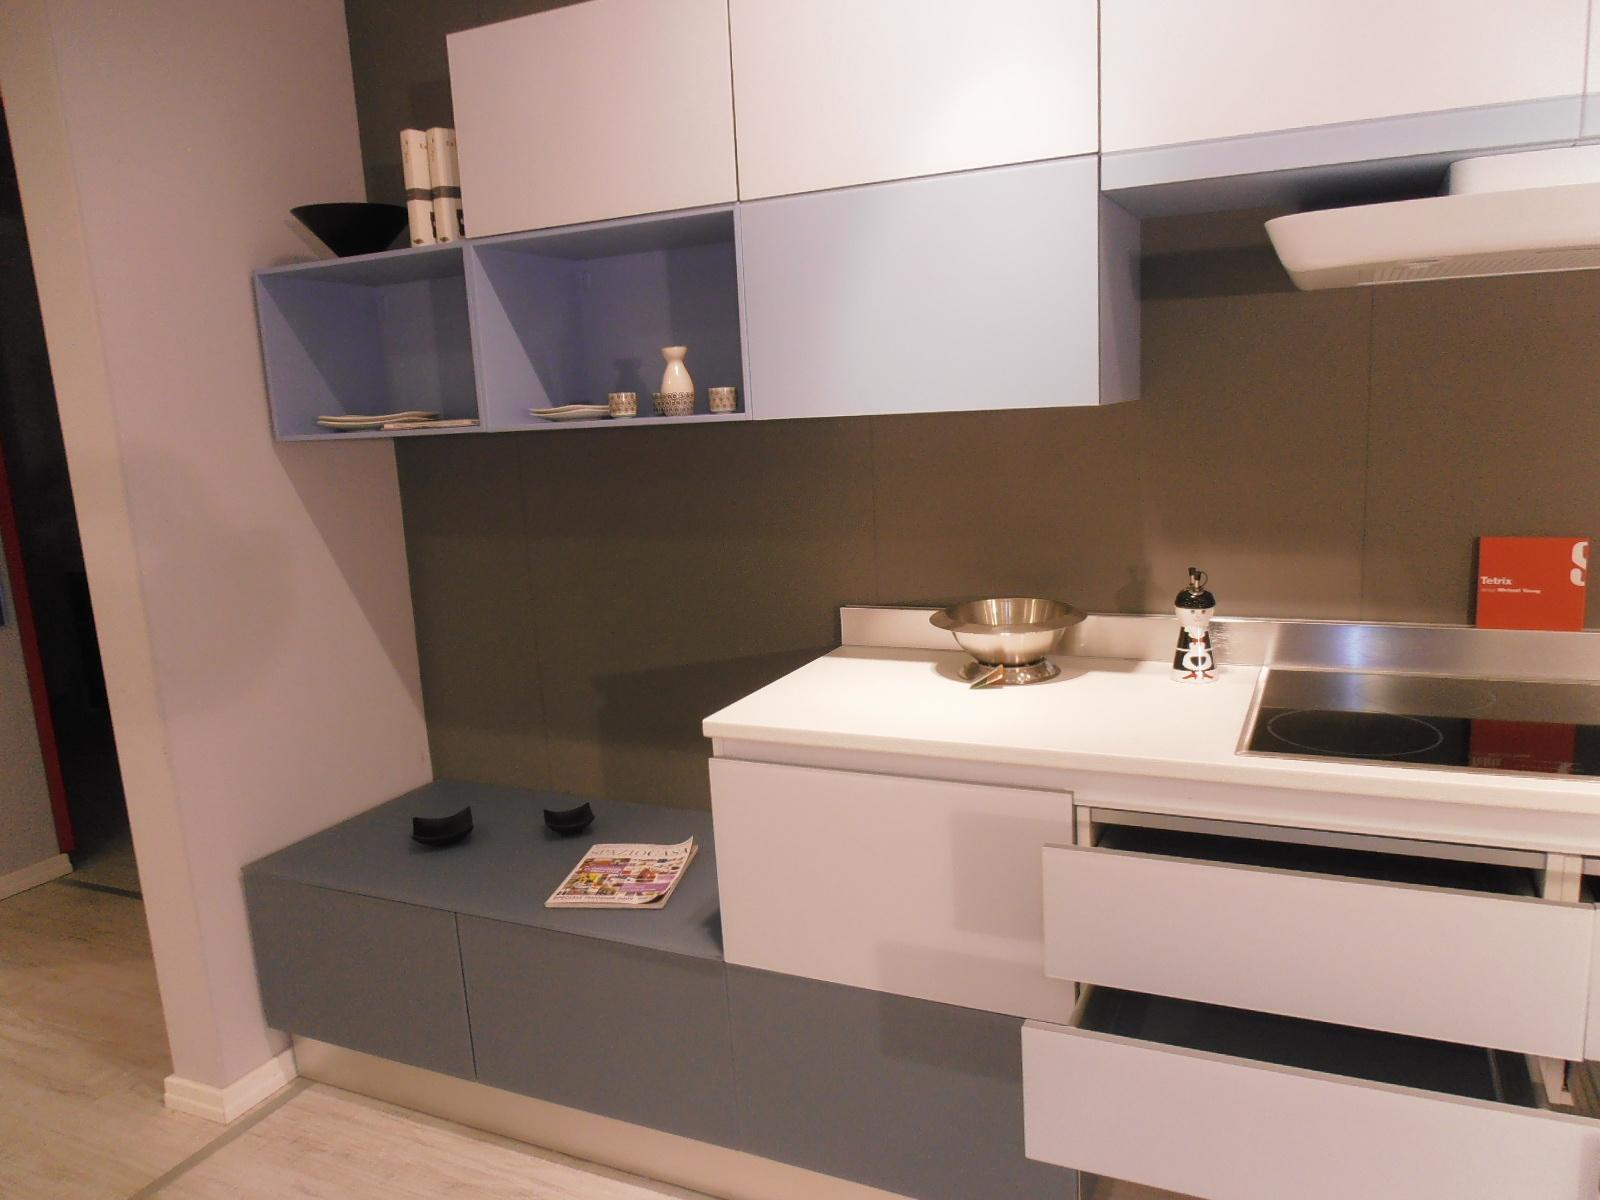 Stunning Cucina Tetrix Scavolini Ideas - ferrorods.us - ferrorods.us